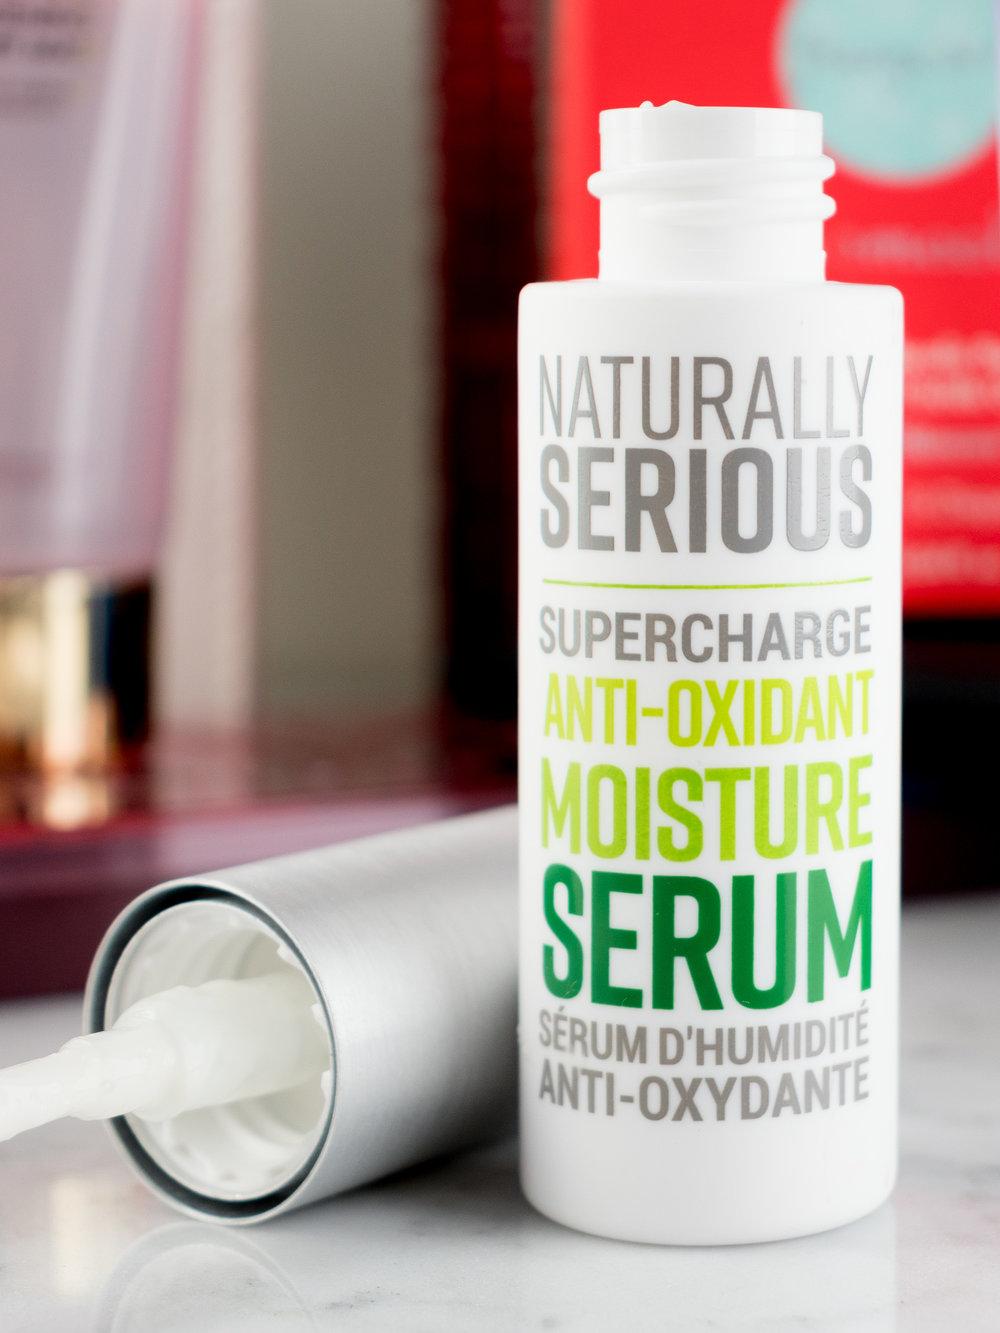 Naturally Serious Supercharge Anti-Oxidant Moisture Serum ,